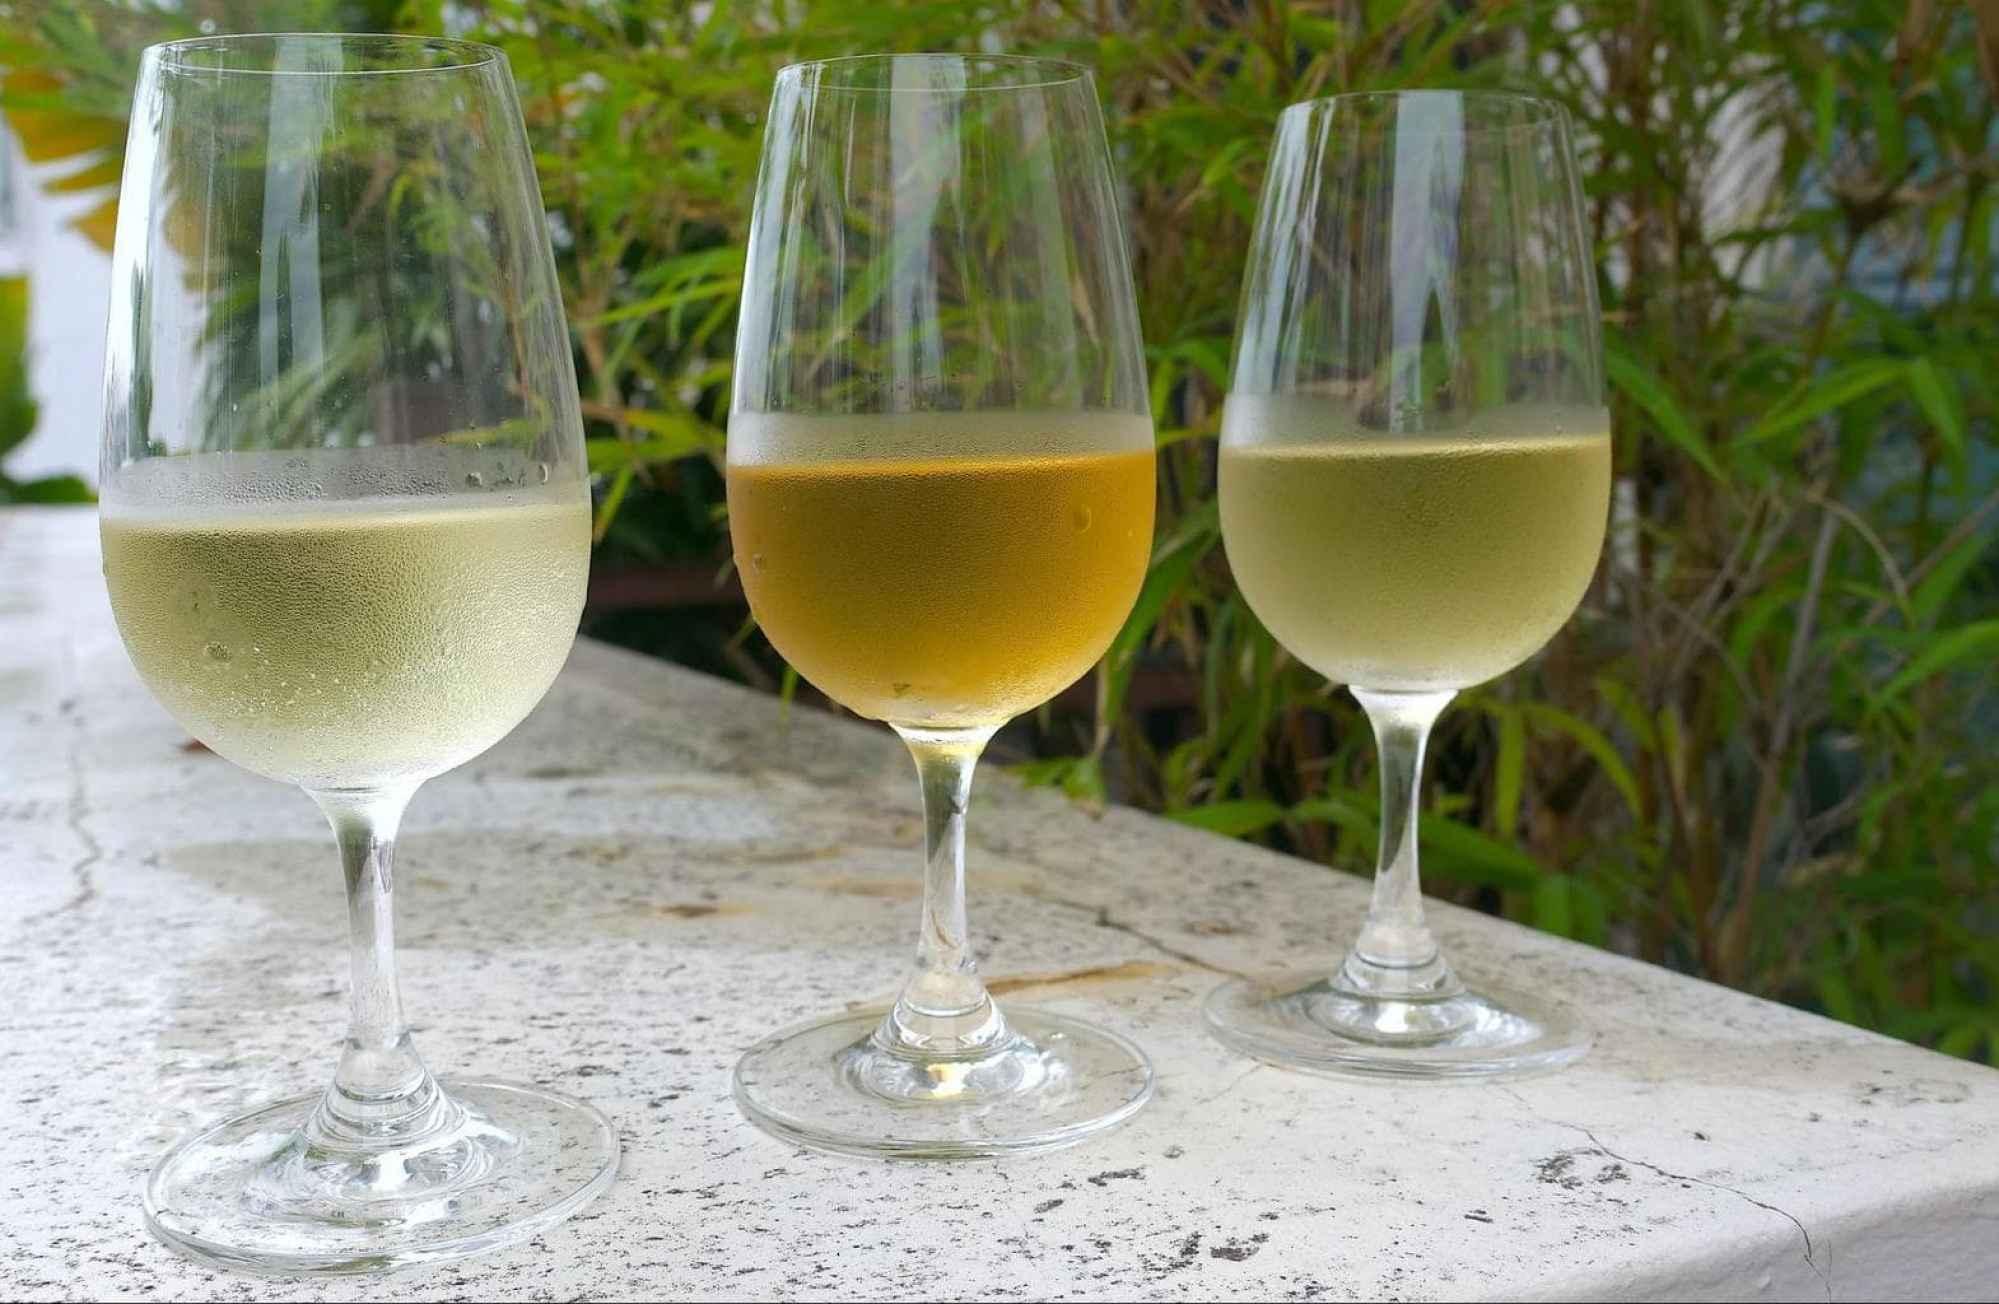 Three full bodied white wines